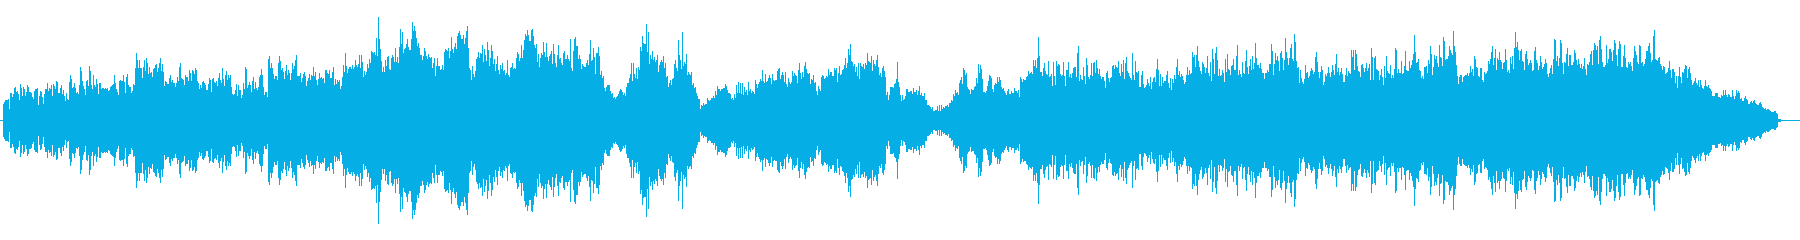 Xmasらしい雰囲気の幻想的な曲の再生済みの波形